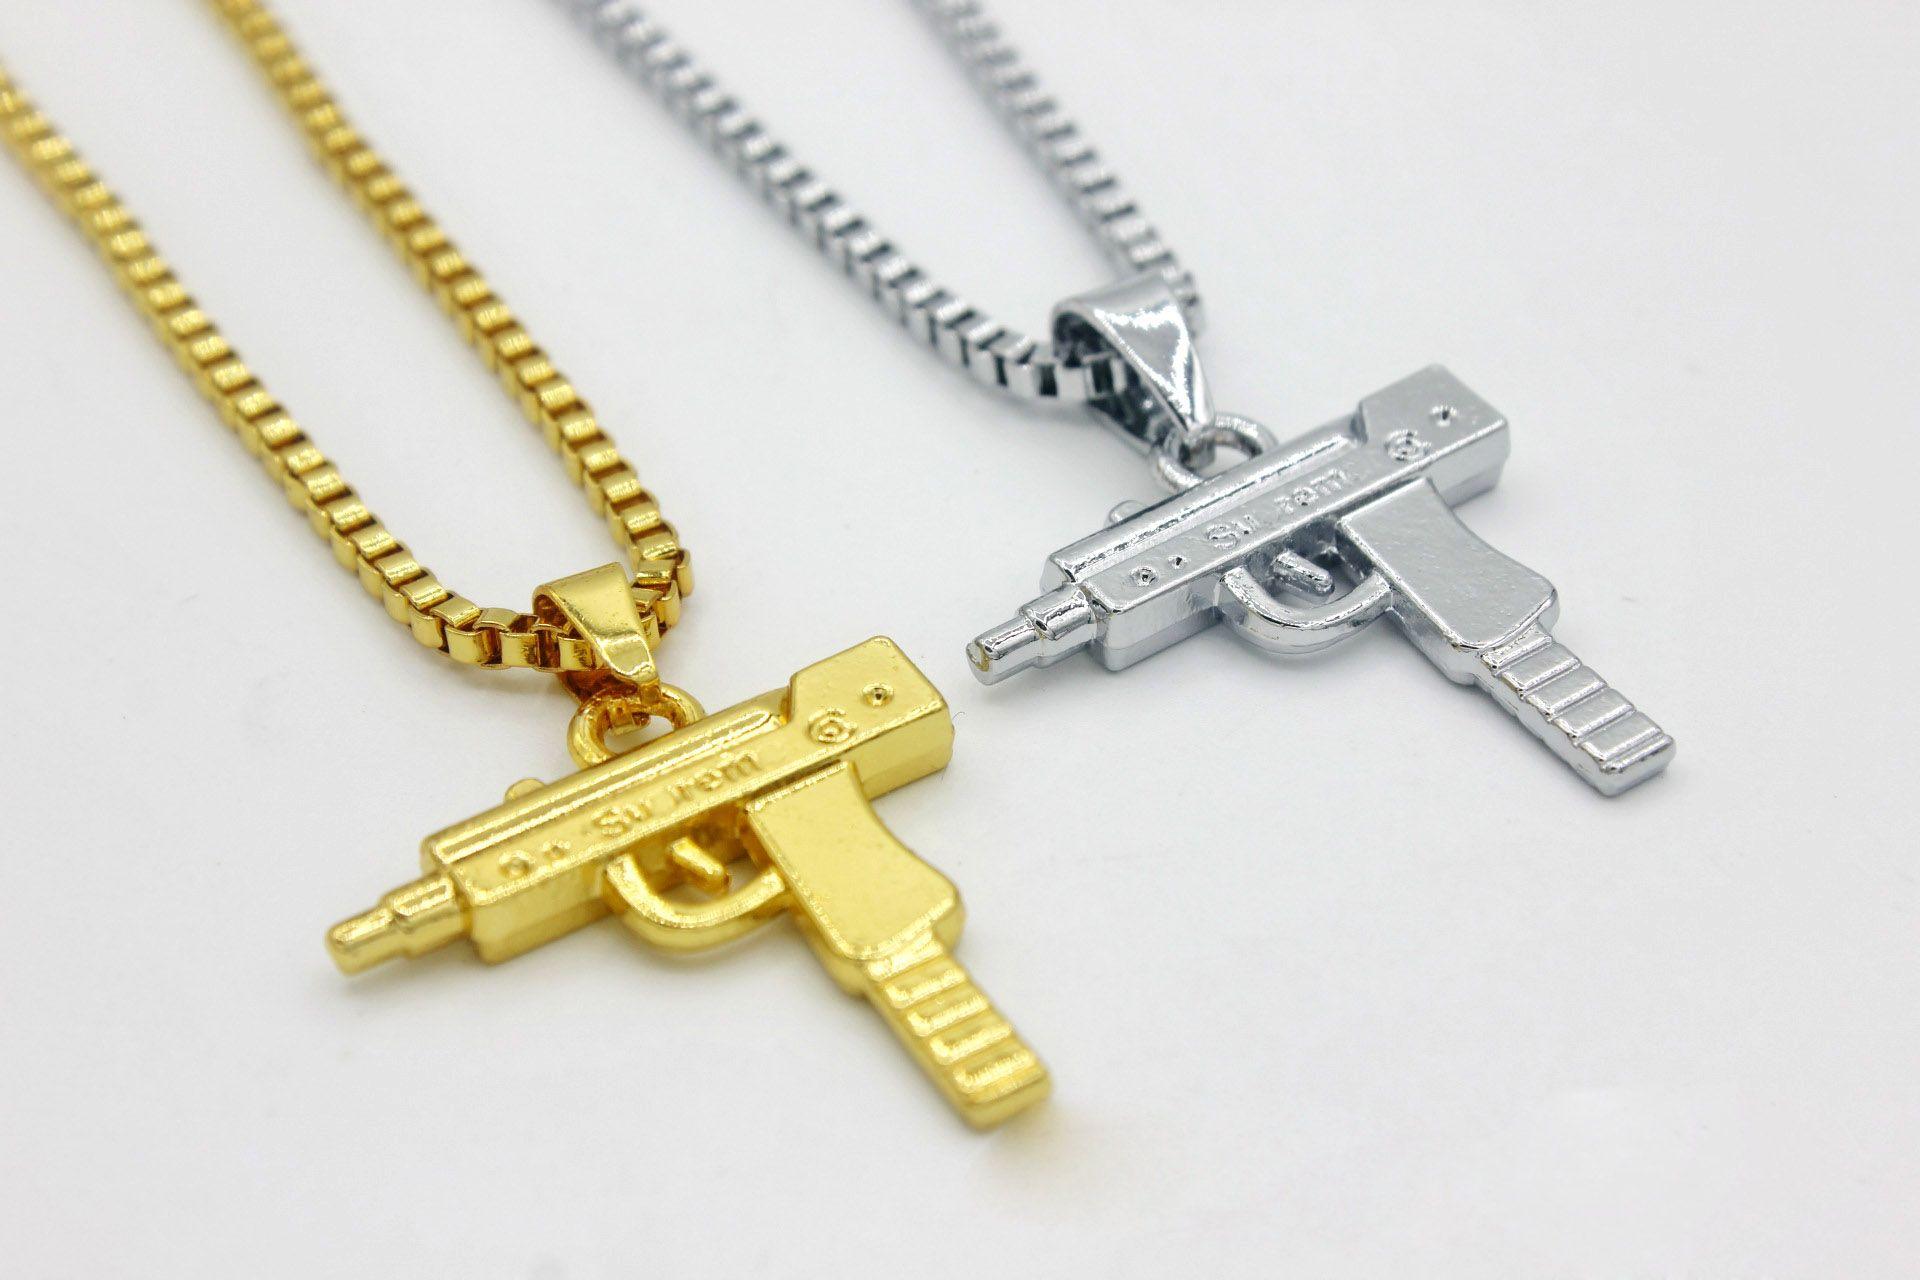 HOT Sale Hip Hop Necklaces Engraved Gun Shape Uzi Golden Pendant High Quality Necklace Gold Chain Popular Fashion Pendant Jewelry